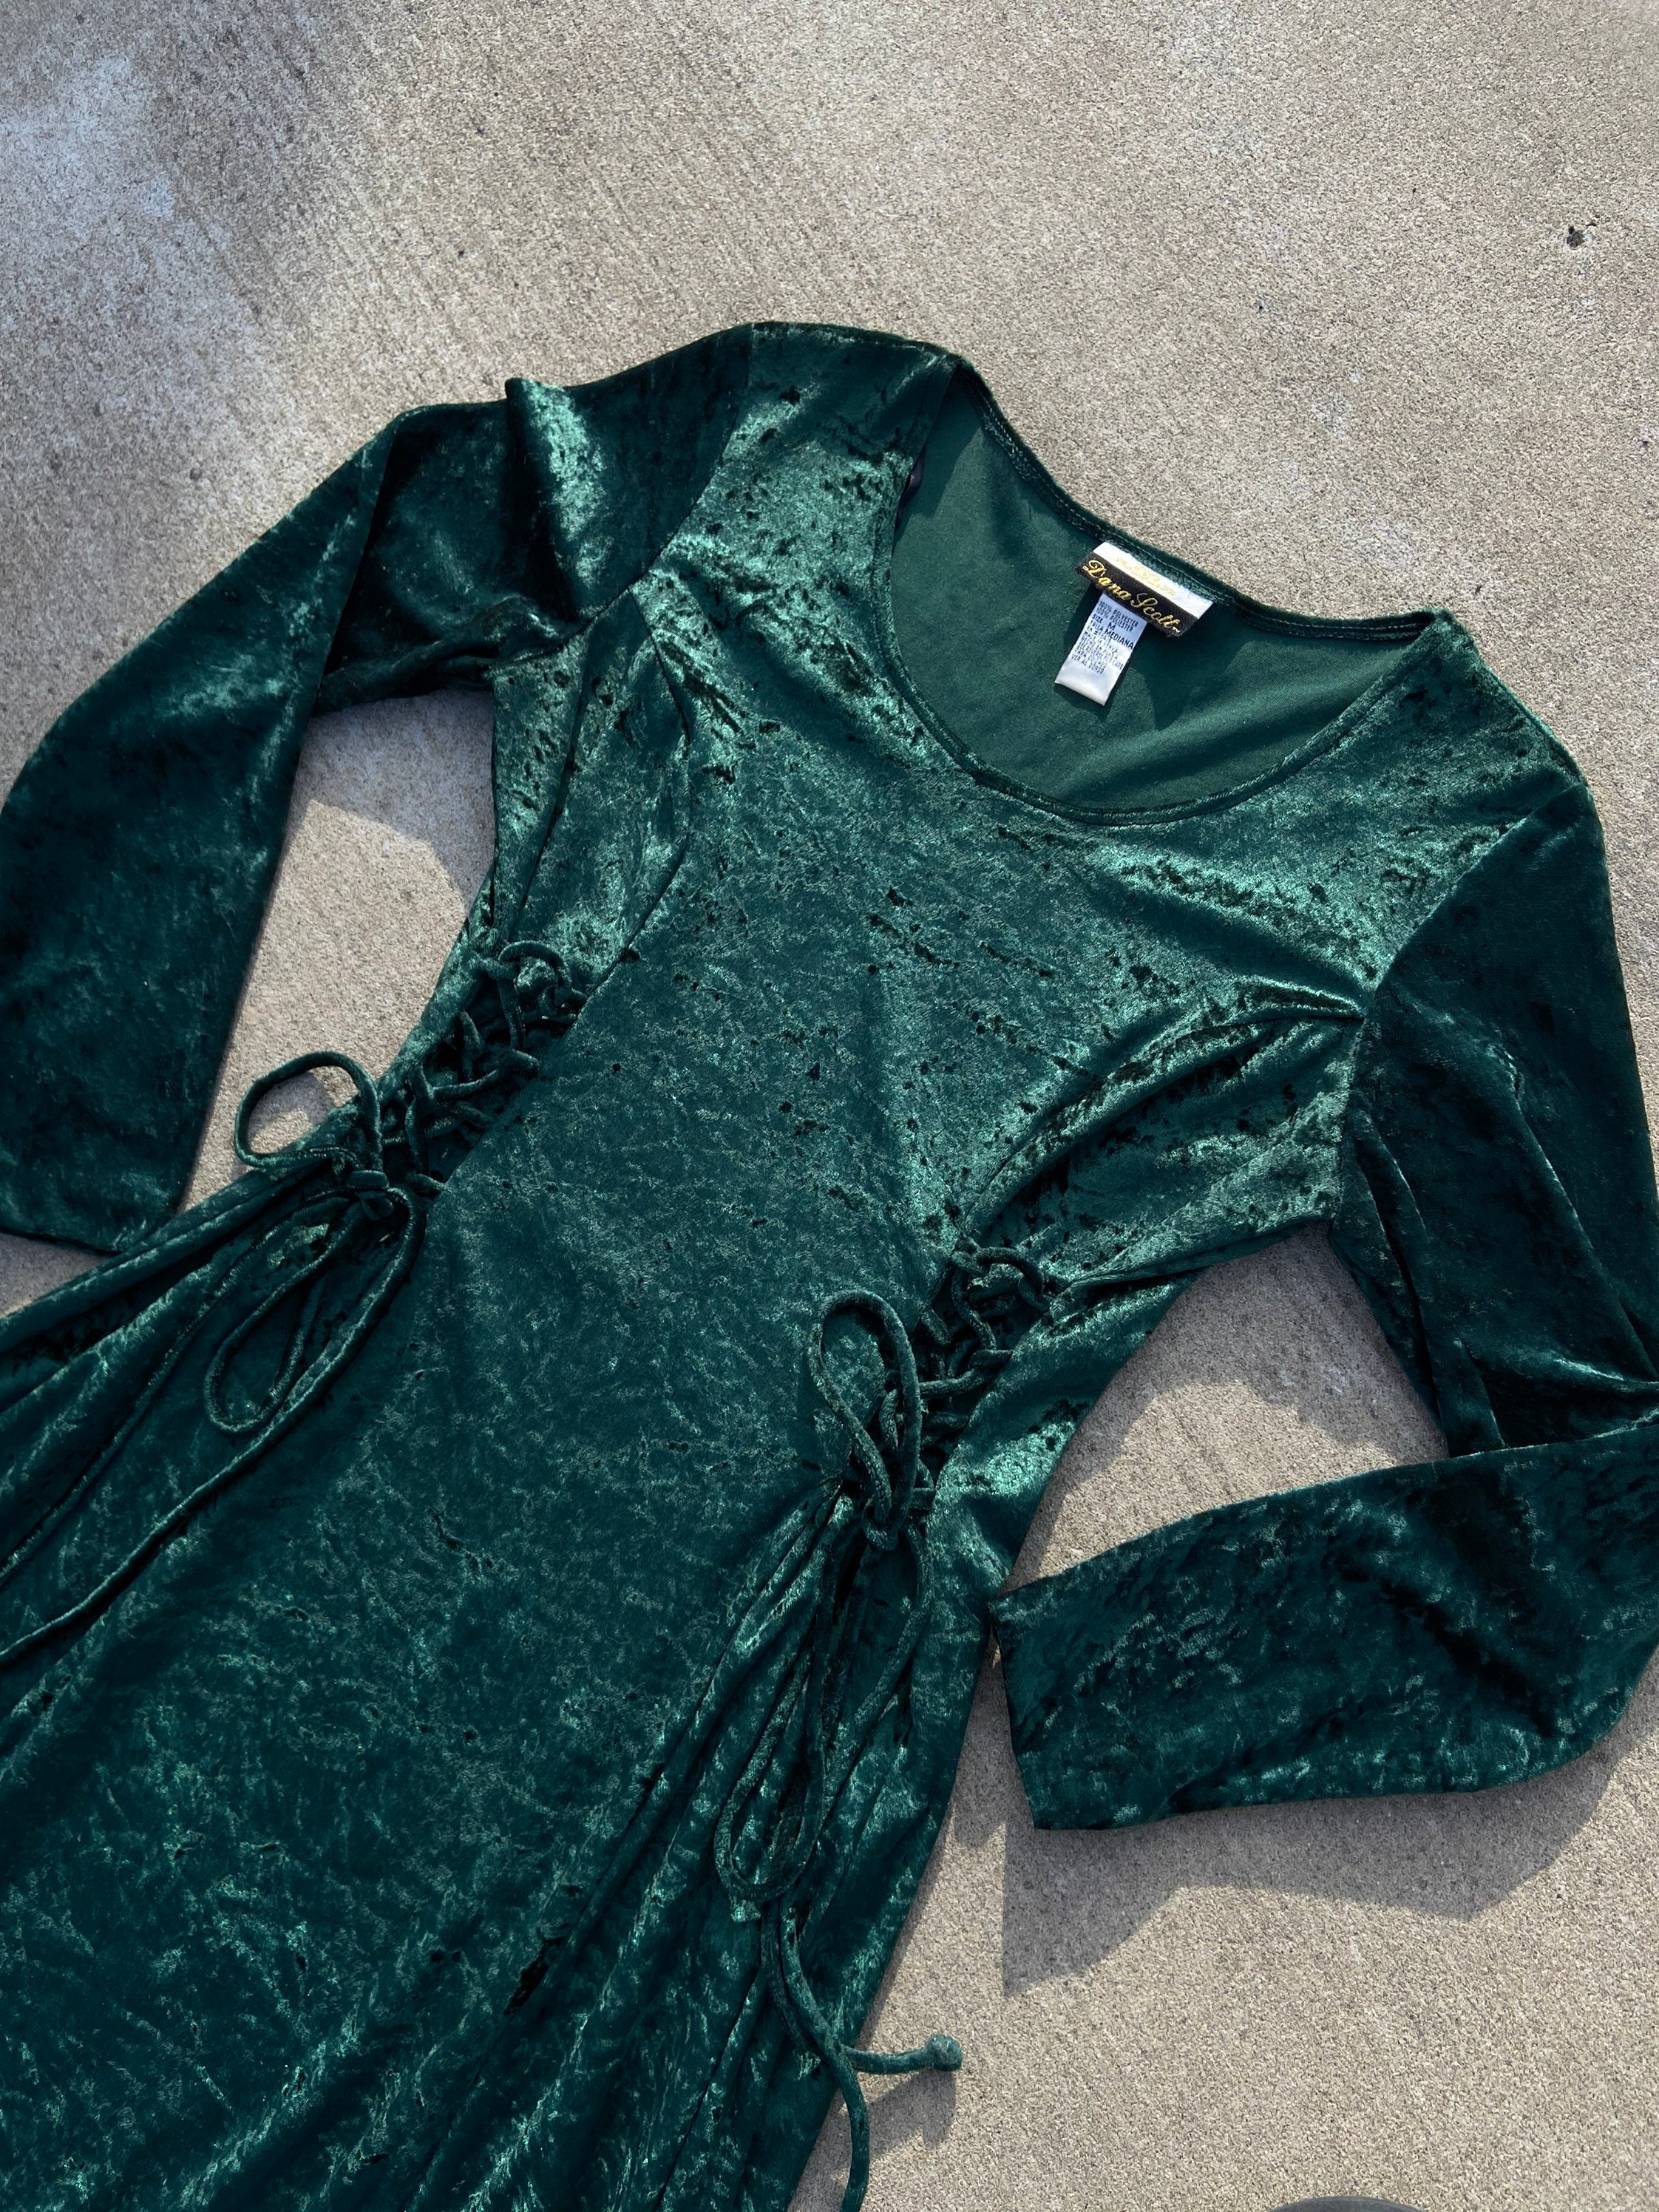 80s Dresses   Casual to Party Dresses Vintage 1980S 80S Emerald Green Crush Velvet Lace Tie Front Long Maxi Dress Soft Womens Size Medium Boho Hippie Festival Fairy Witch $8.00 AT vintagedancer.com